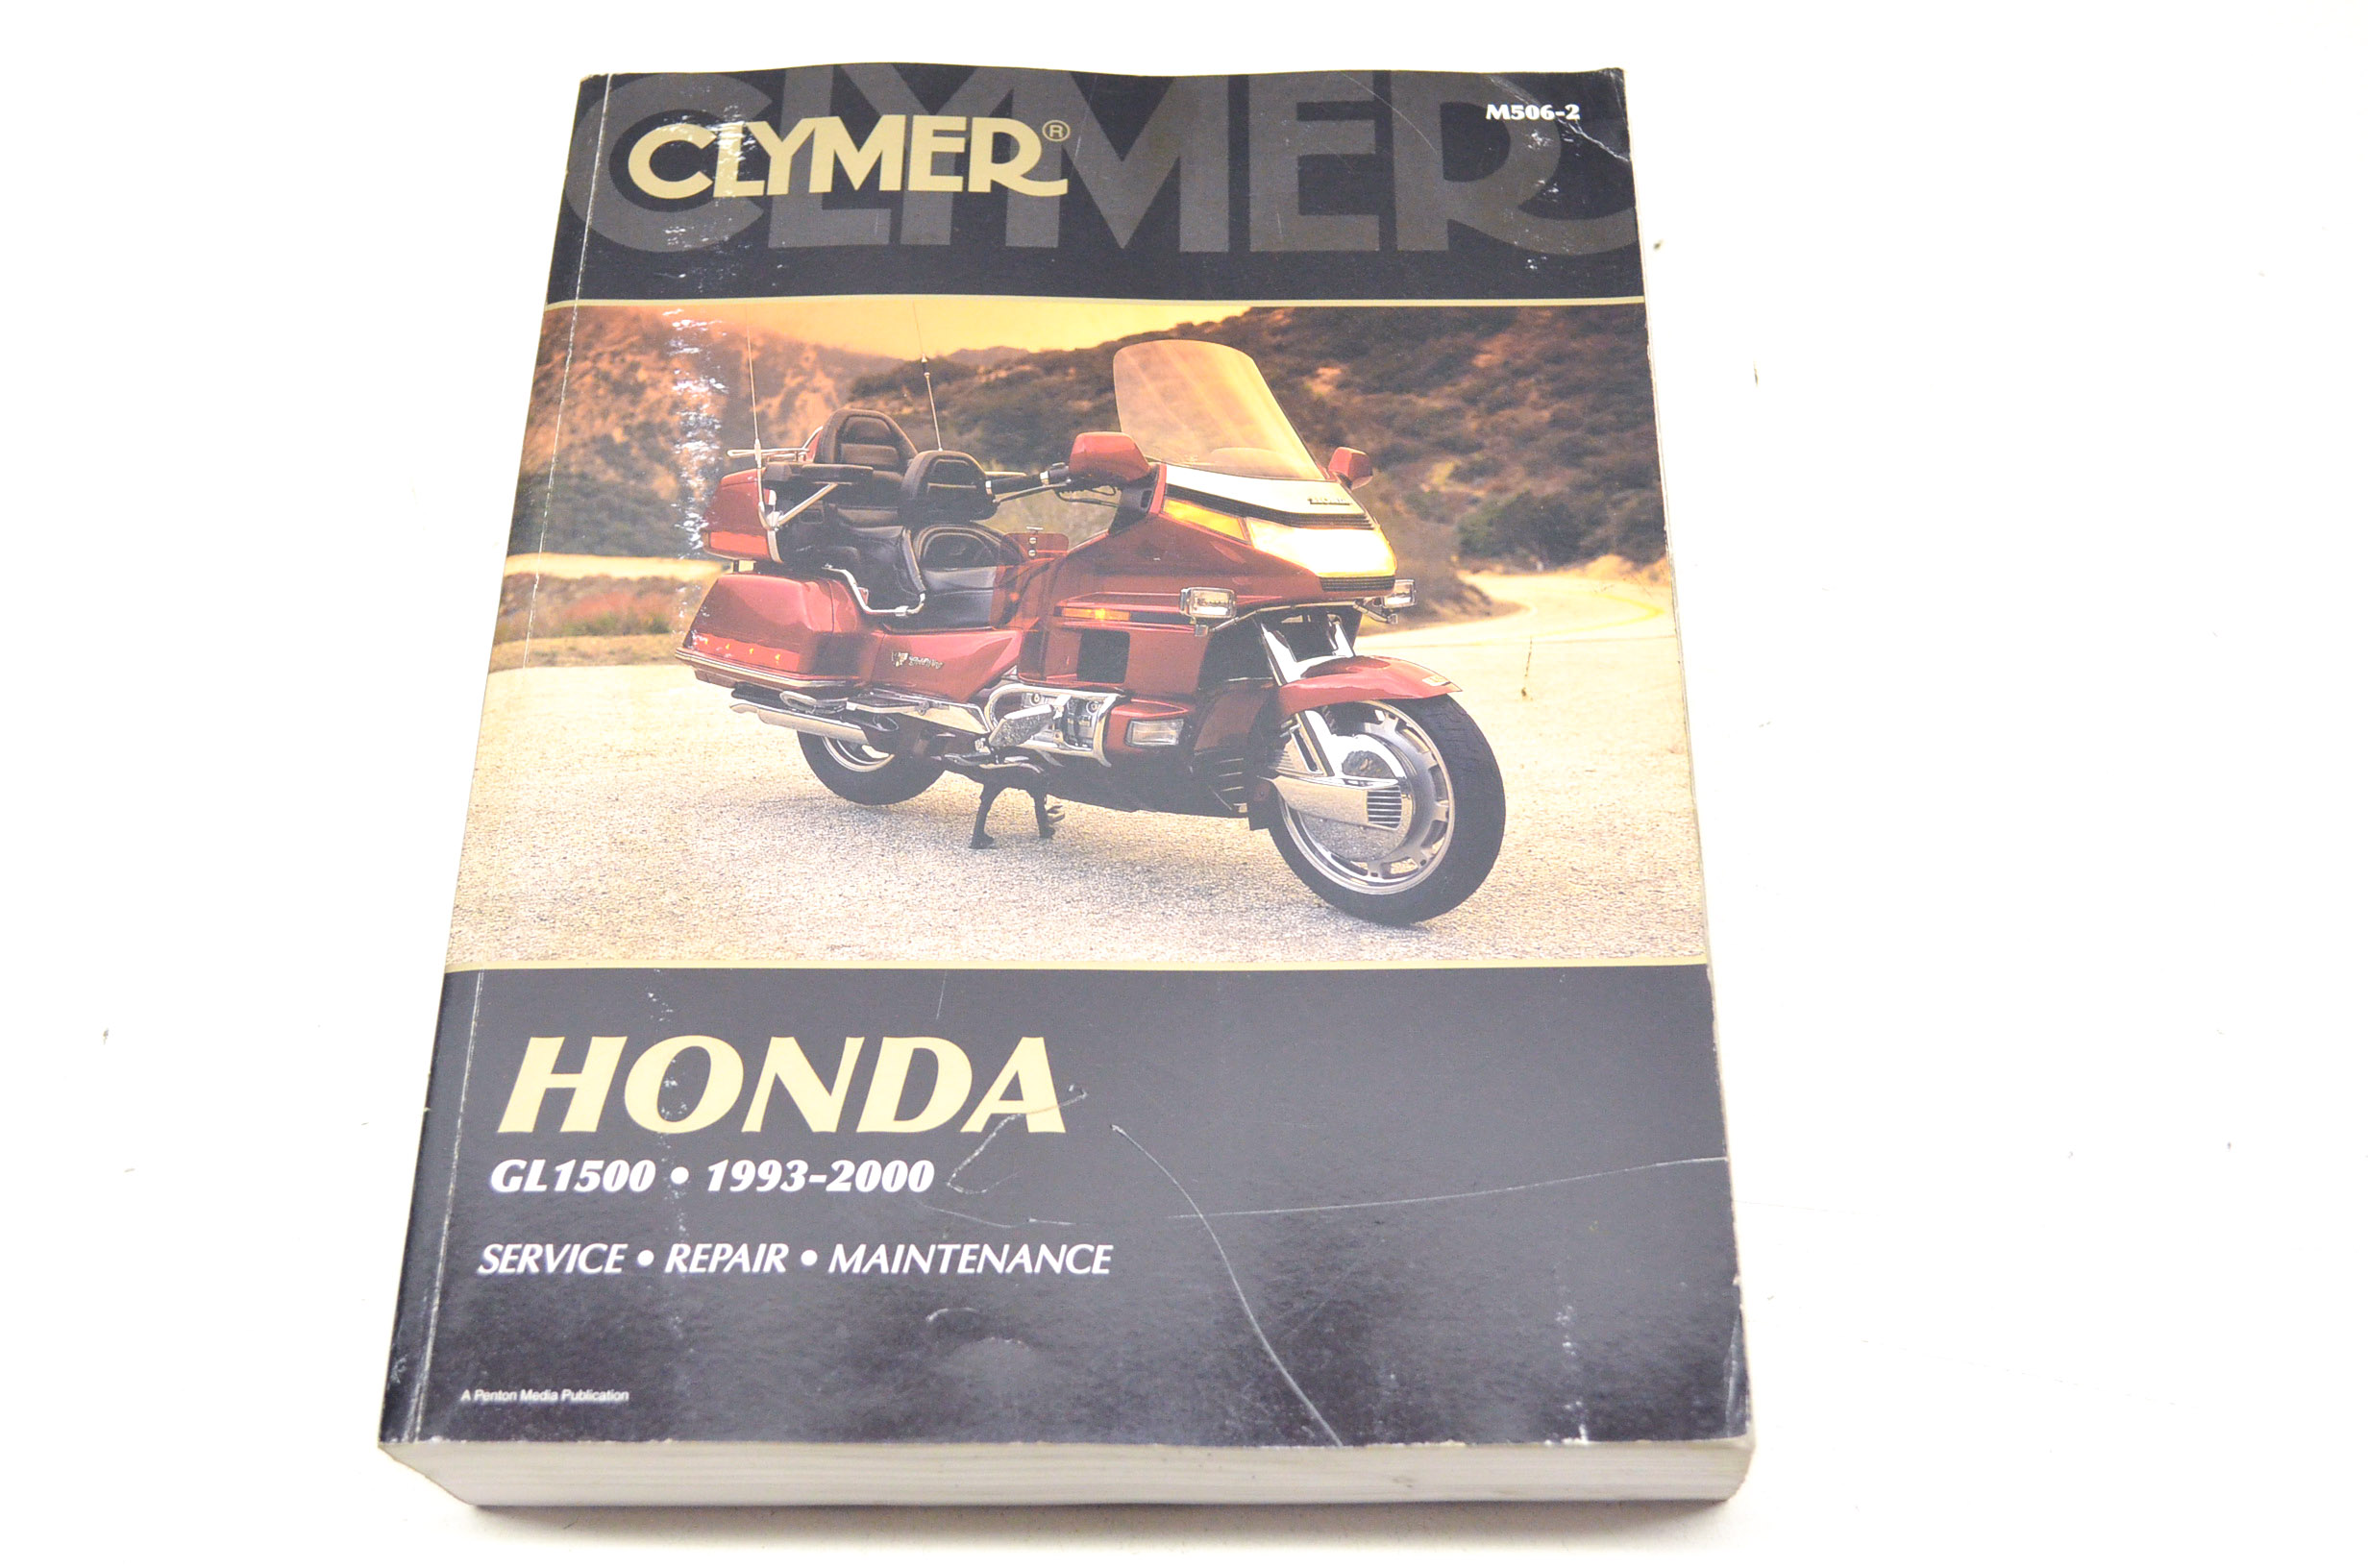 Clymer M506-2 Honda GL1500 93-00 Service Repair & Maintenance Manual QTY 1  - Walmart.com